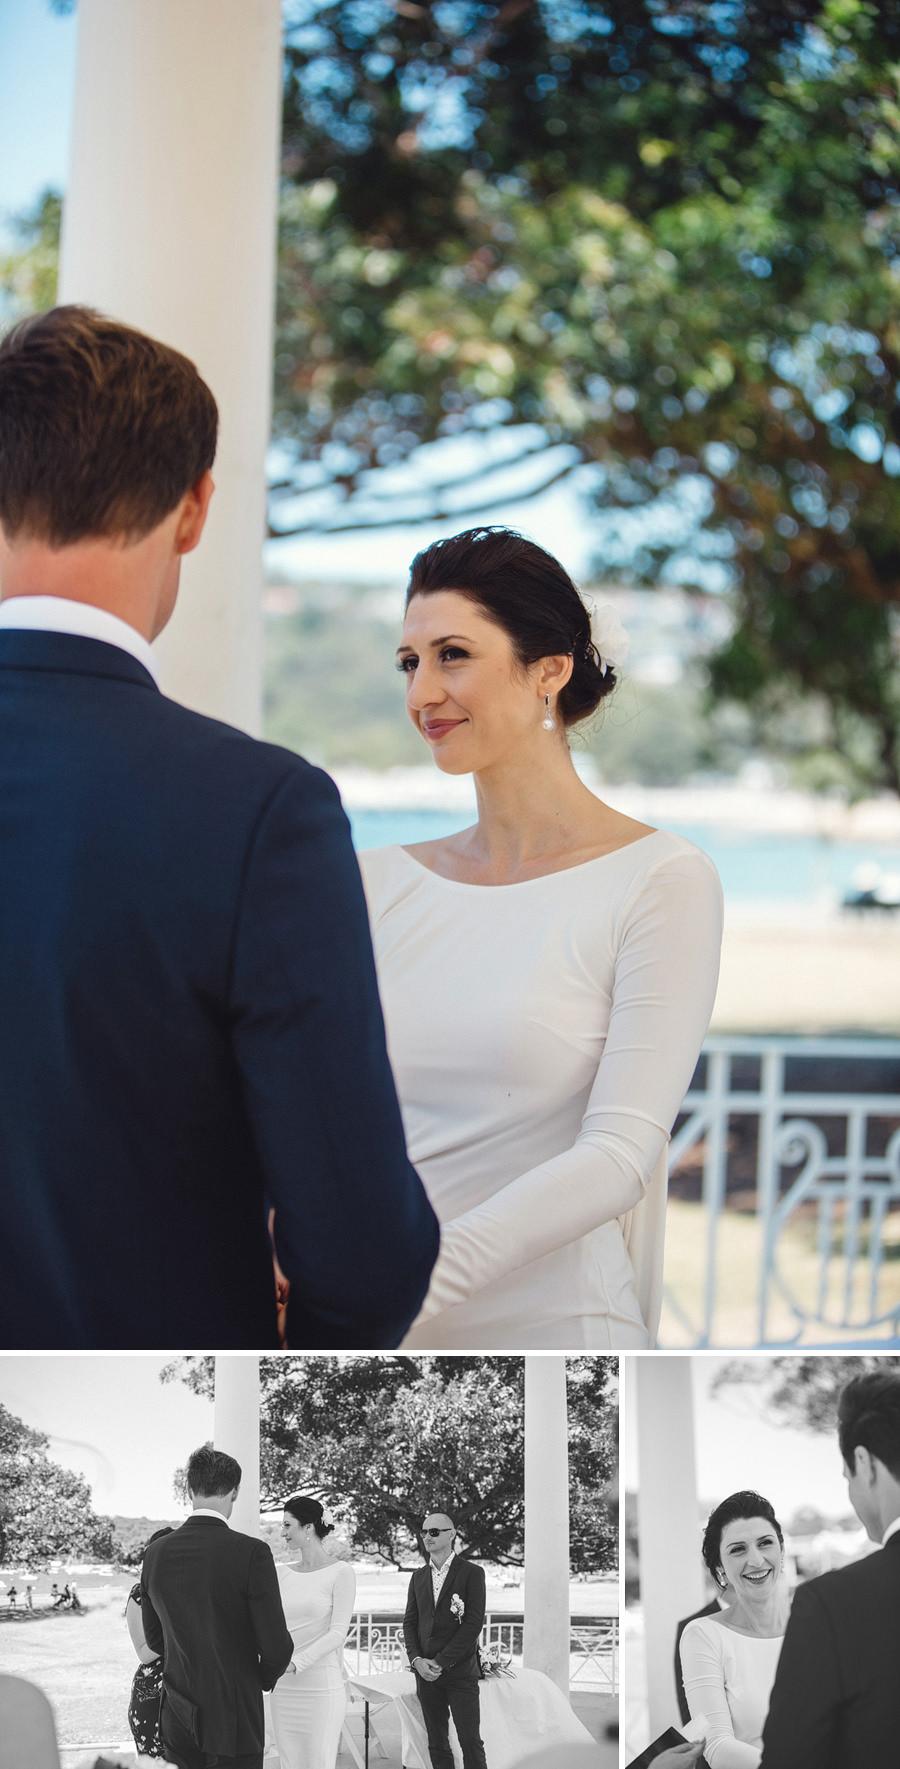 Balmoral Pavilion Wedding Photography: Bride